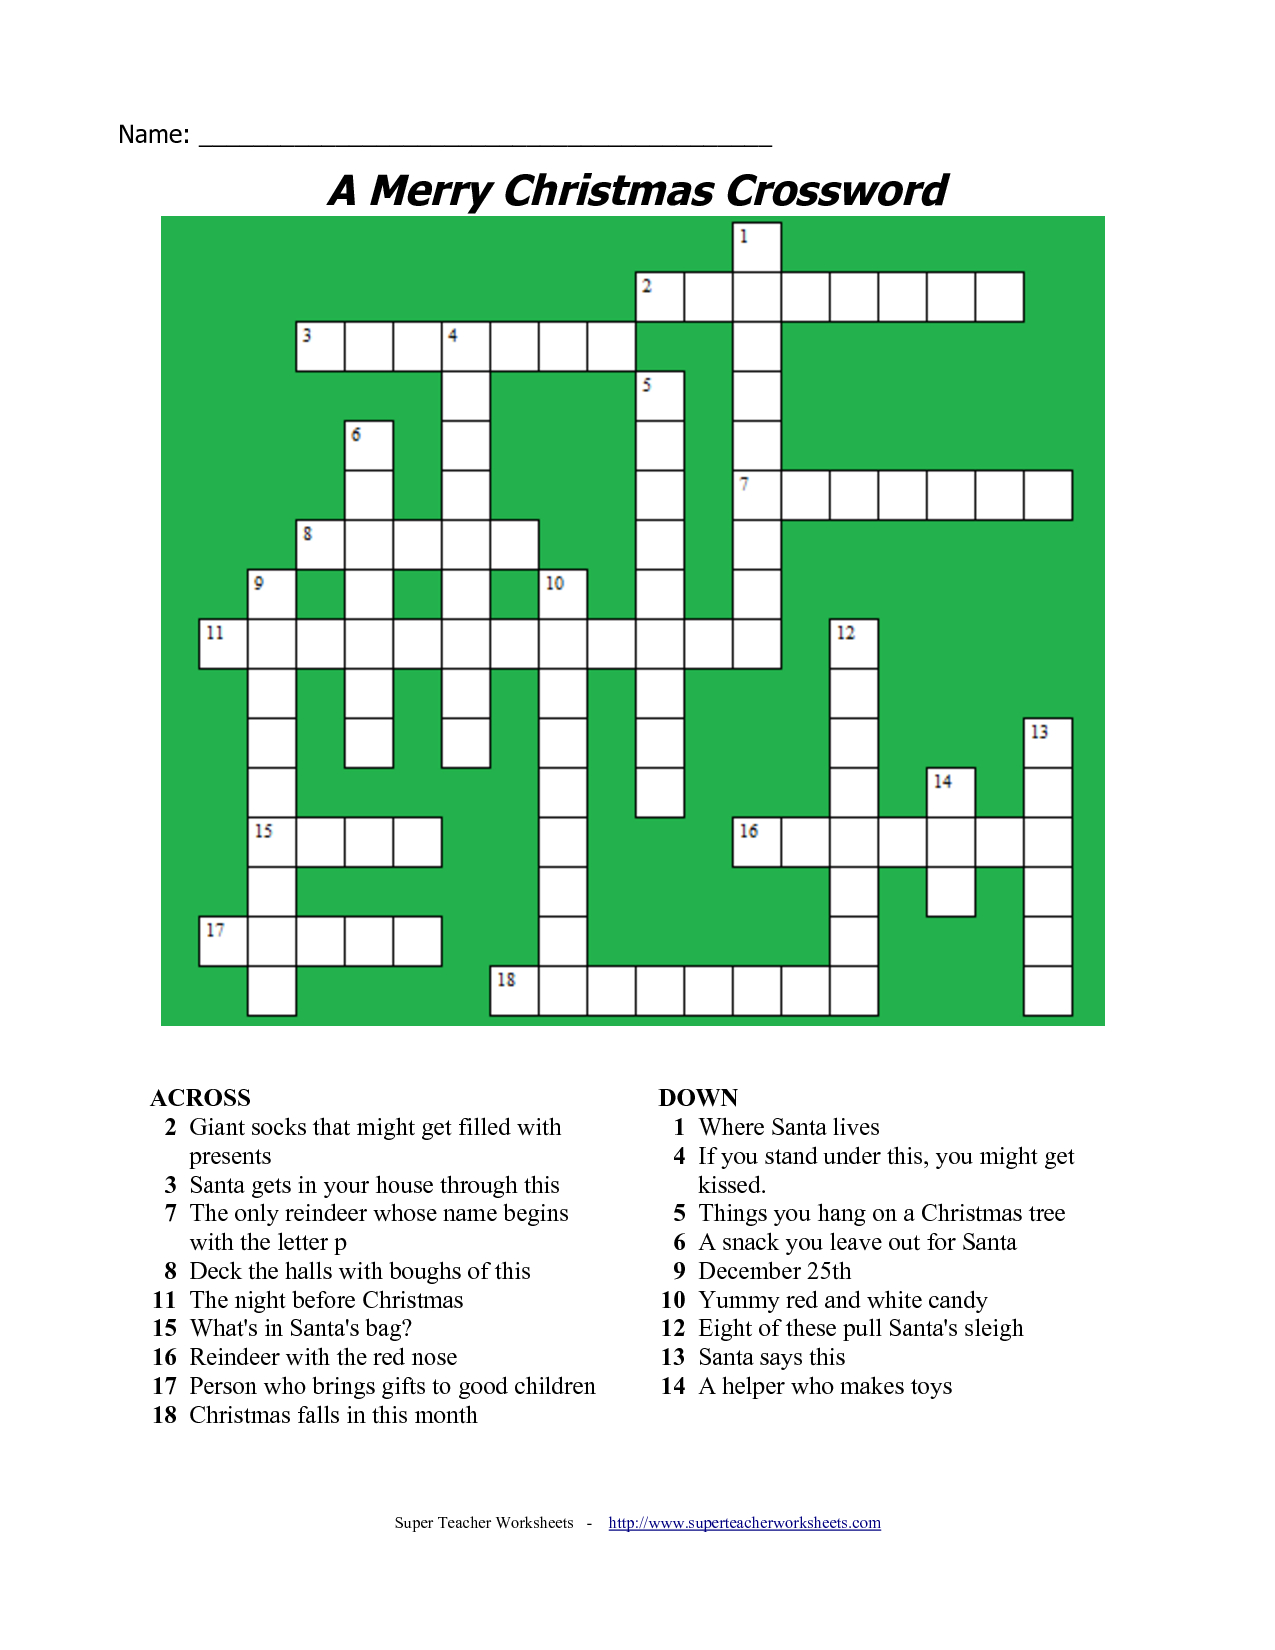 20 Fun Printable Christmas Crossword Puzzles | Kittybabylove - Holiday Crossword Puzzles Printable